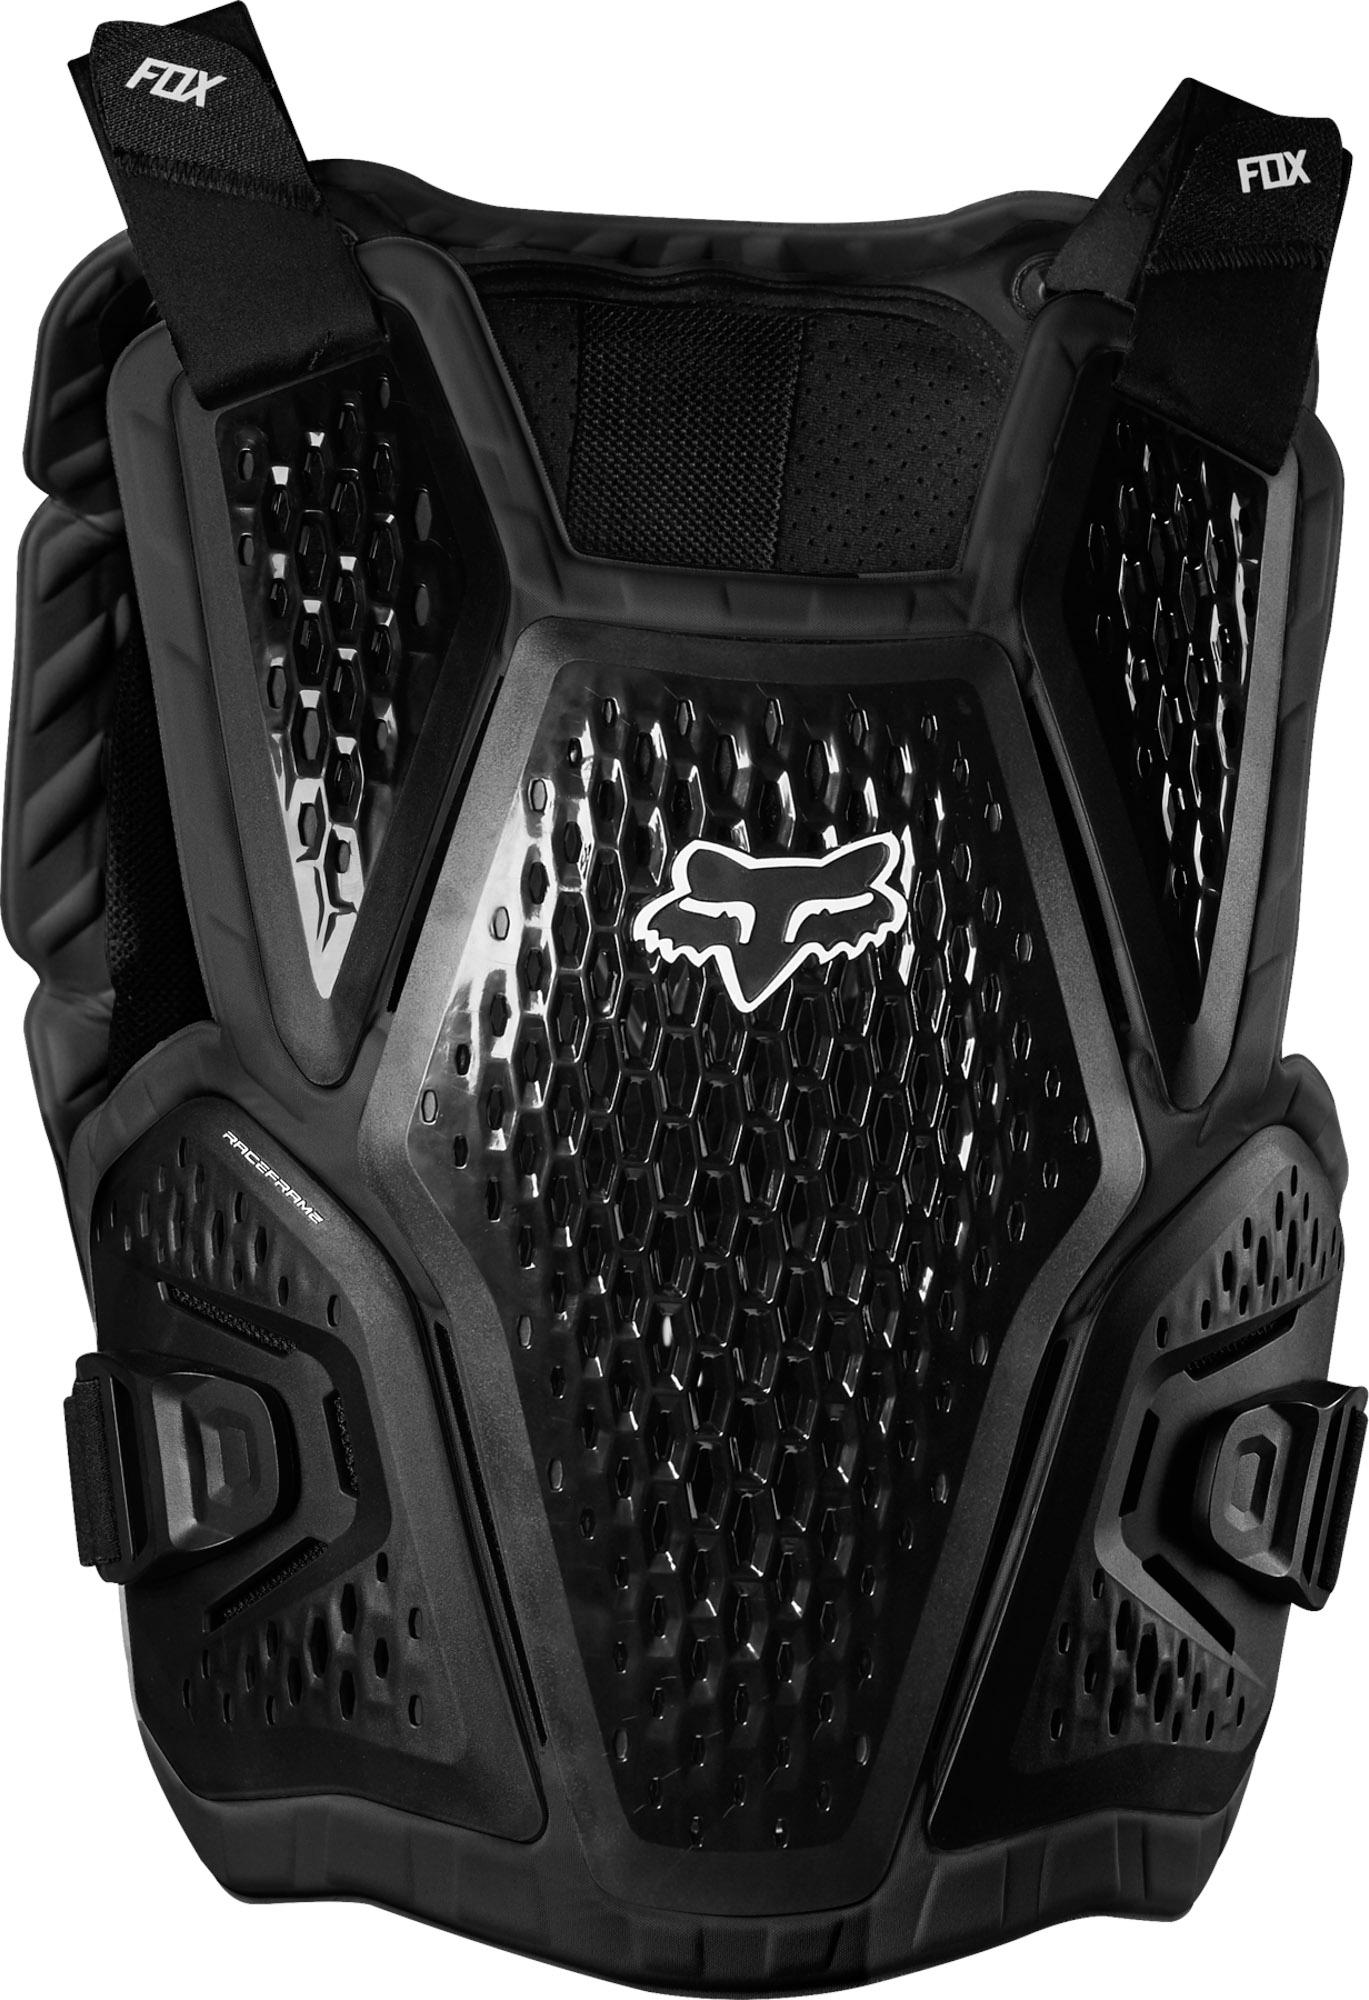 FOX Yth Raceframe Impact, Ce - OS, Black MX22